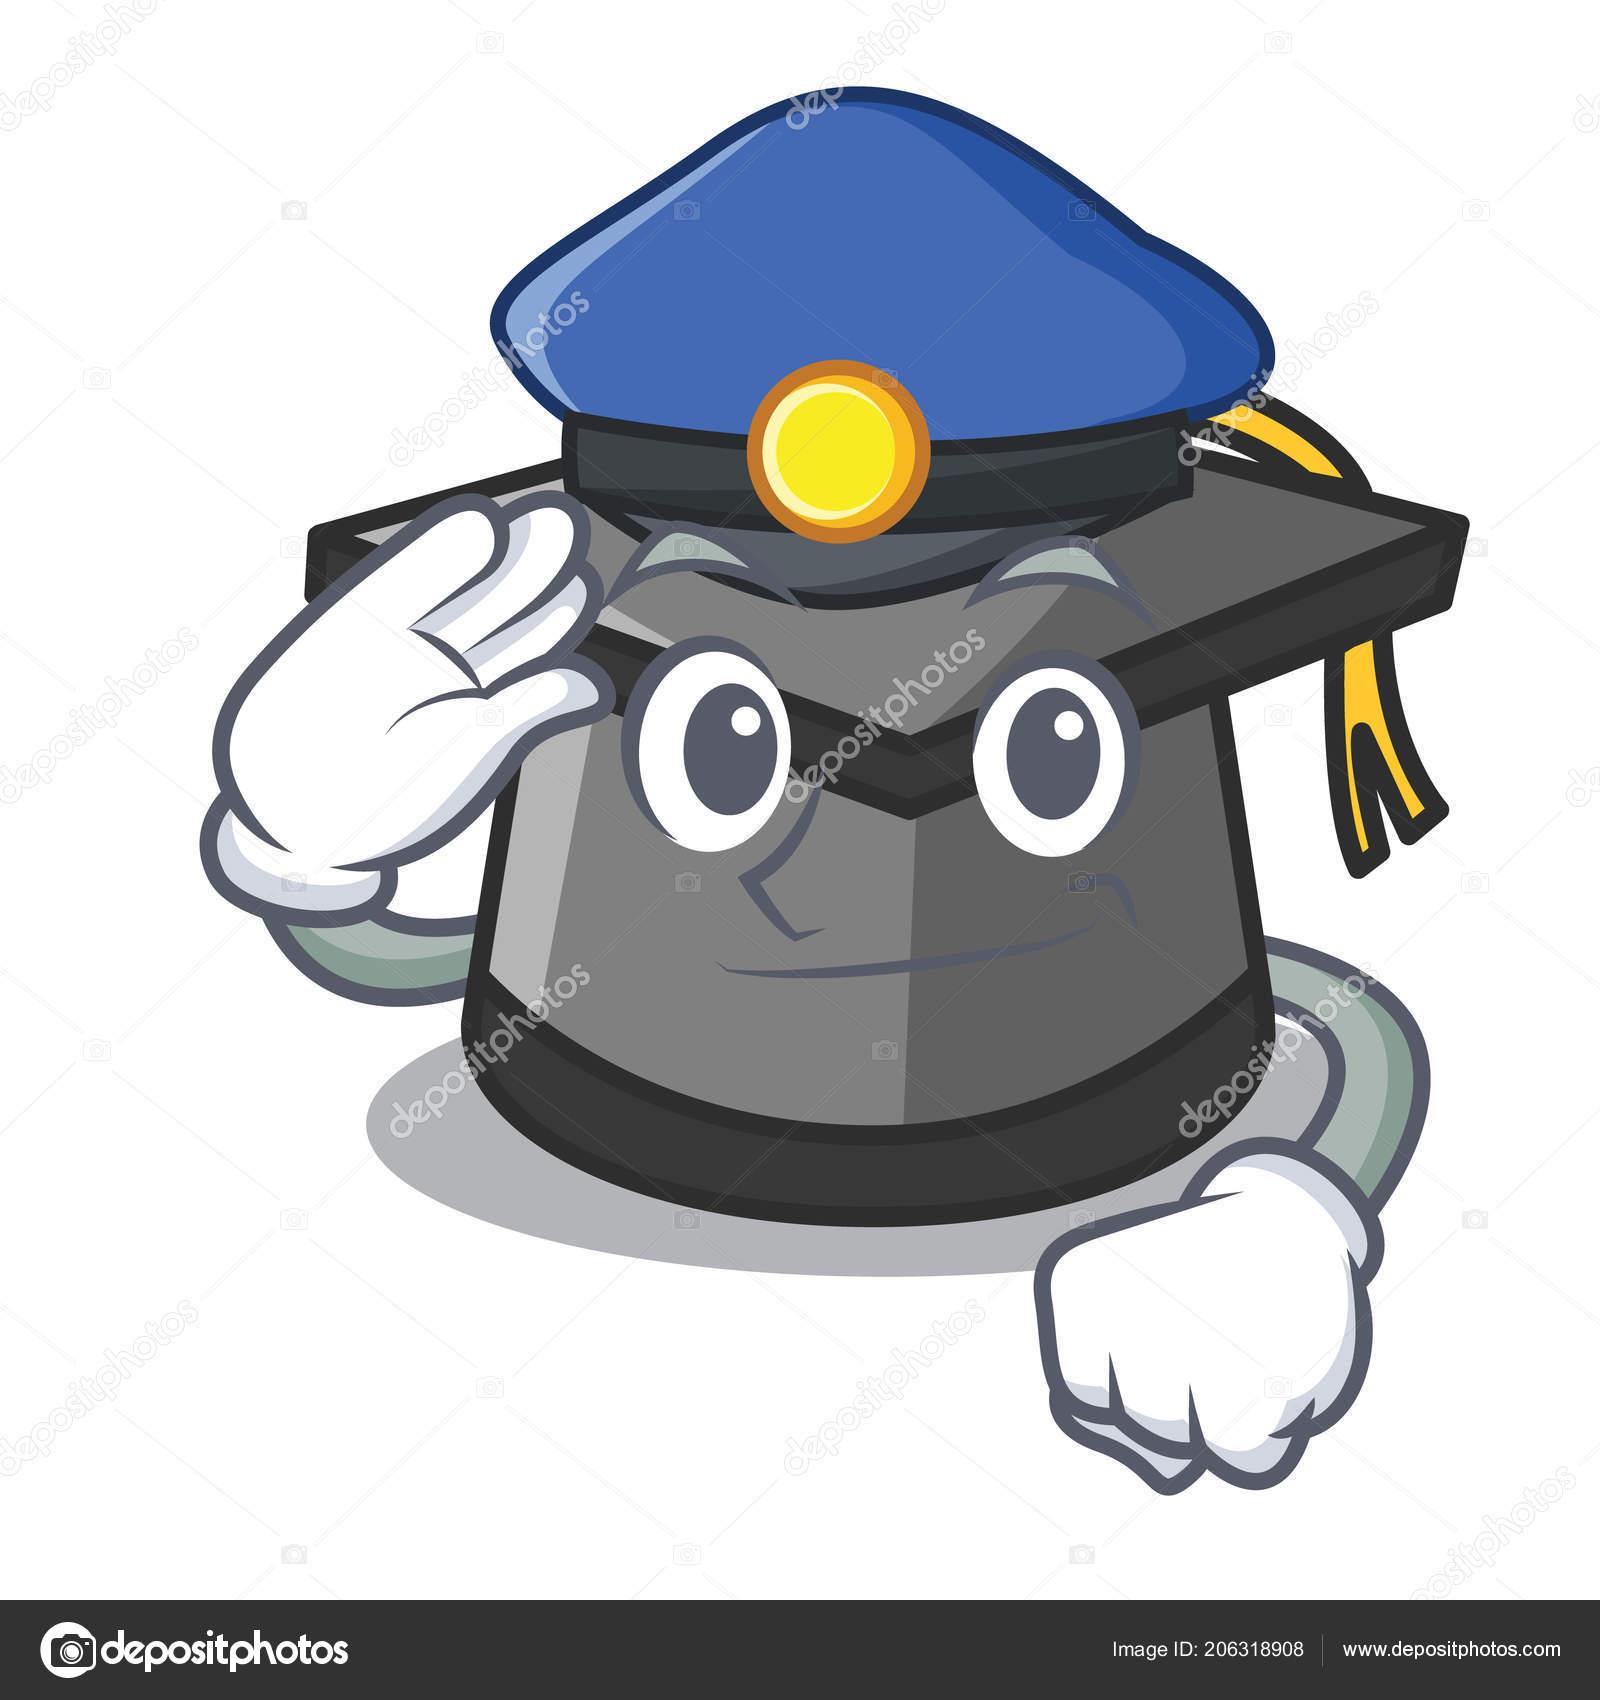 Policie Promoce Klobouk Charakter Kreslene Vektorove Ilustrace